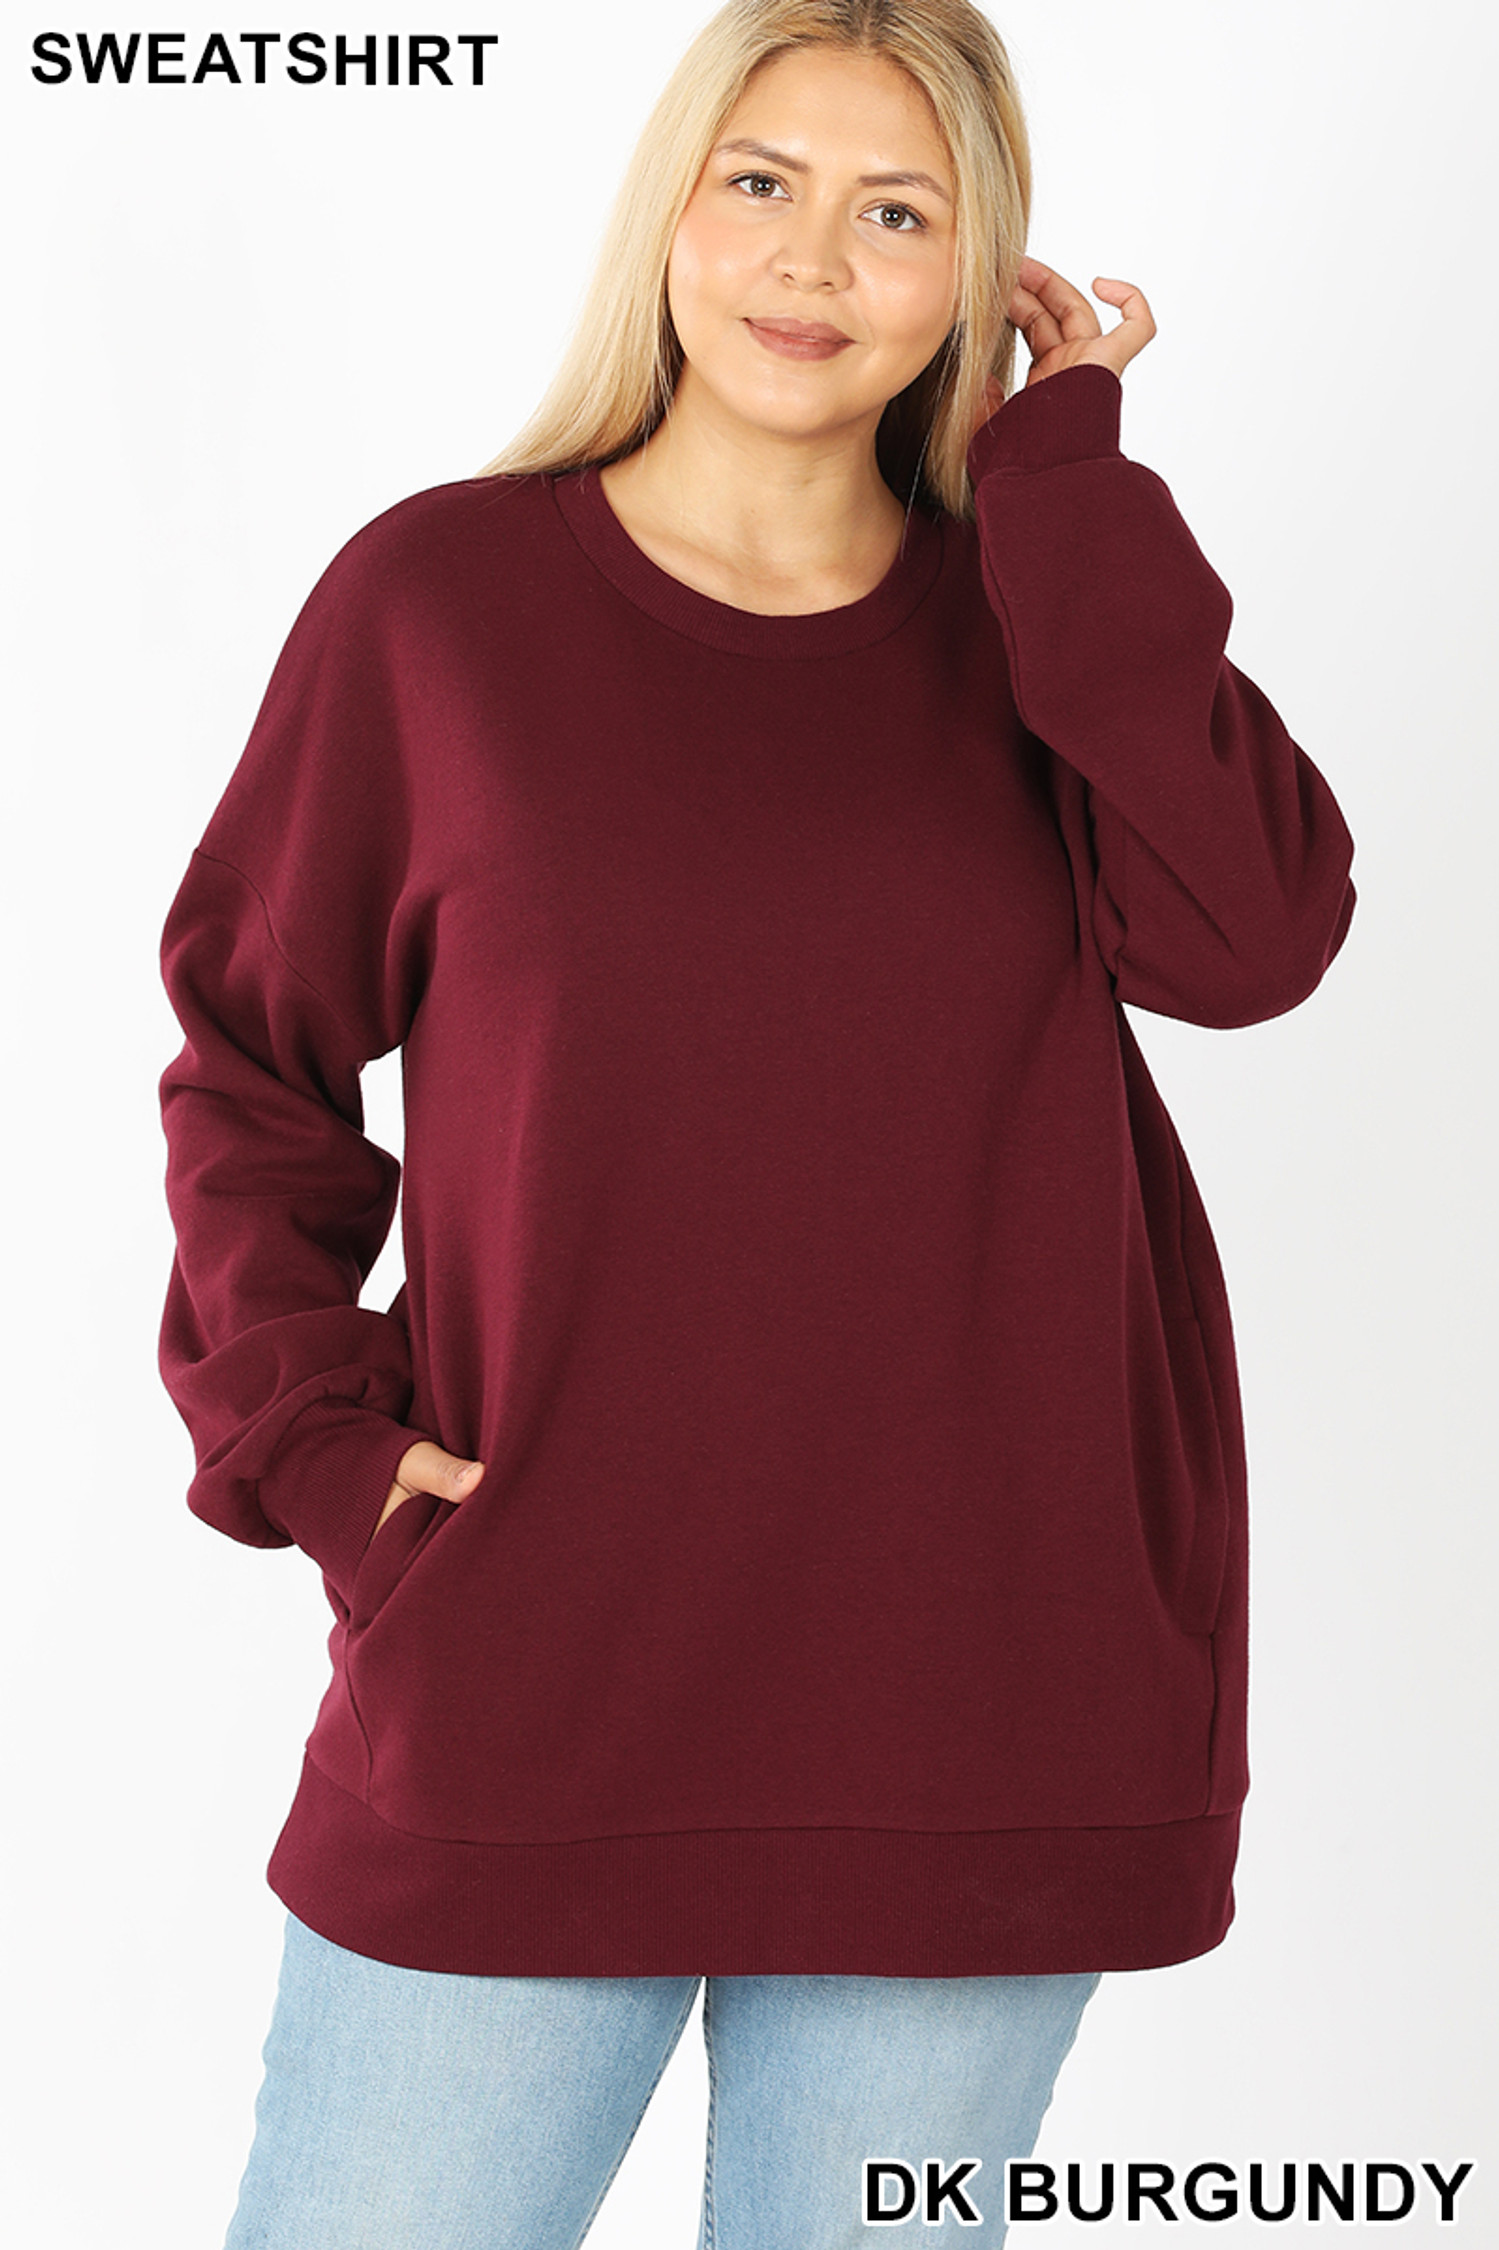 Front image of Dark Burgundy Cotton Round Crew Neck Plus Size Sweatshirt with Side Pockets